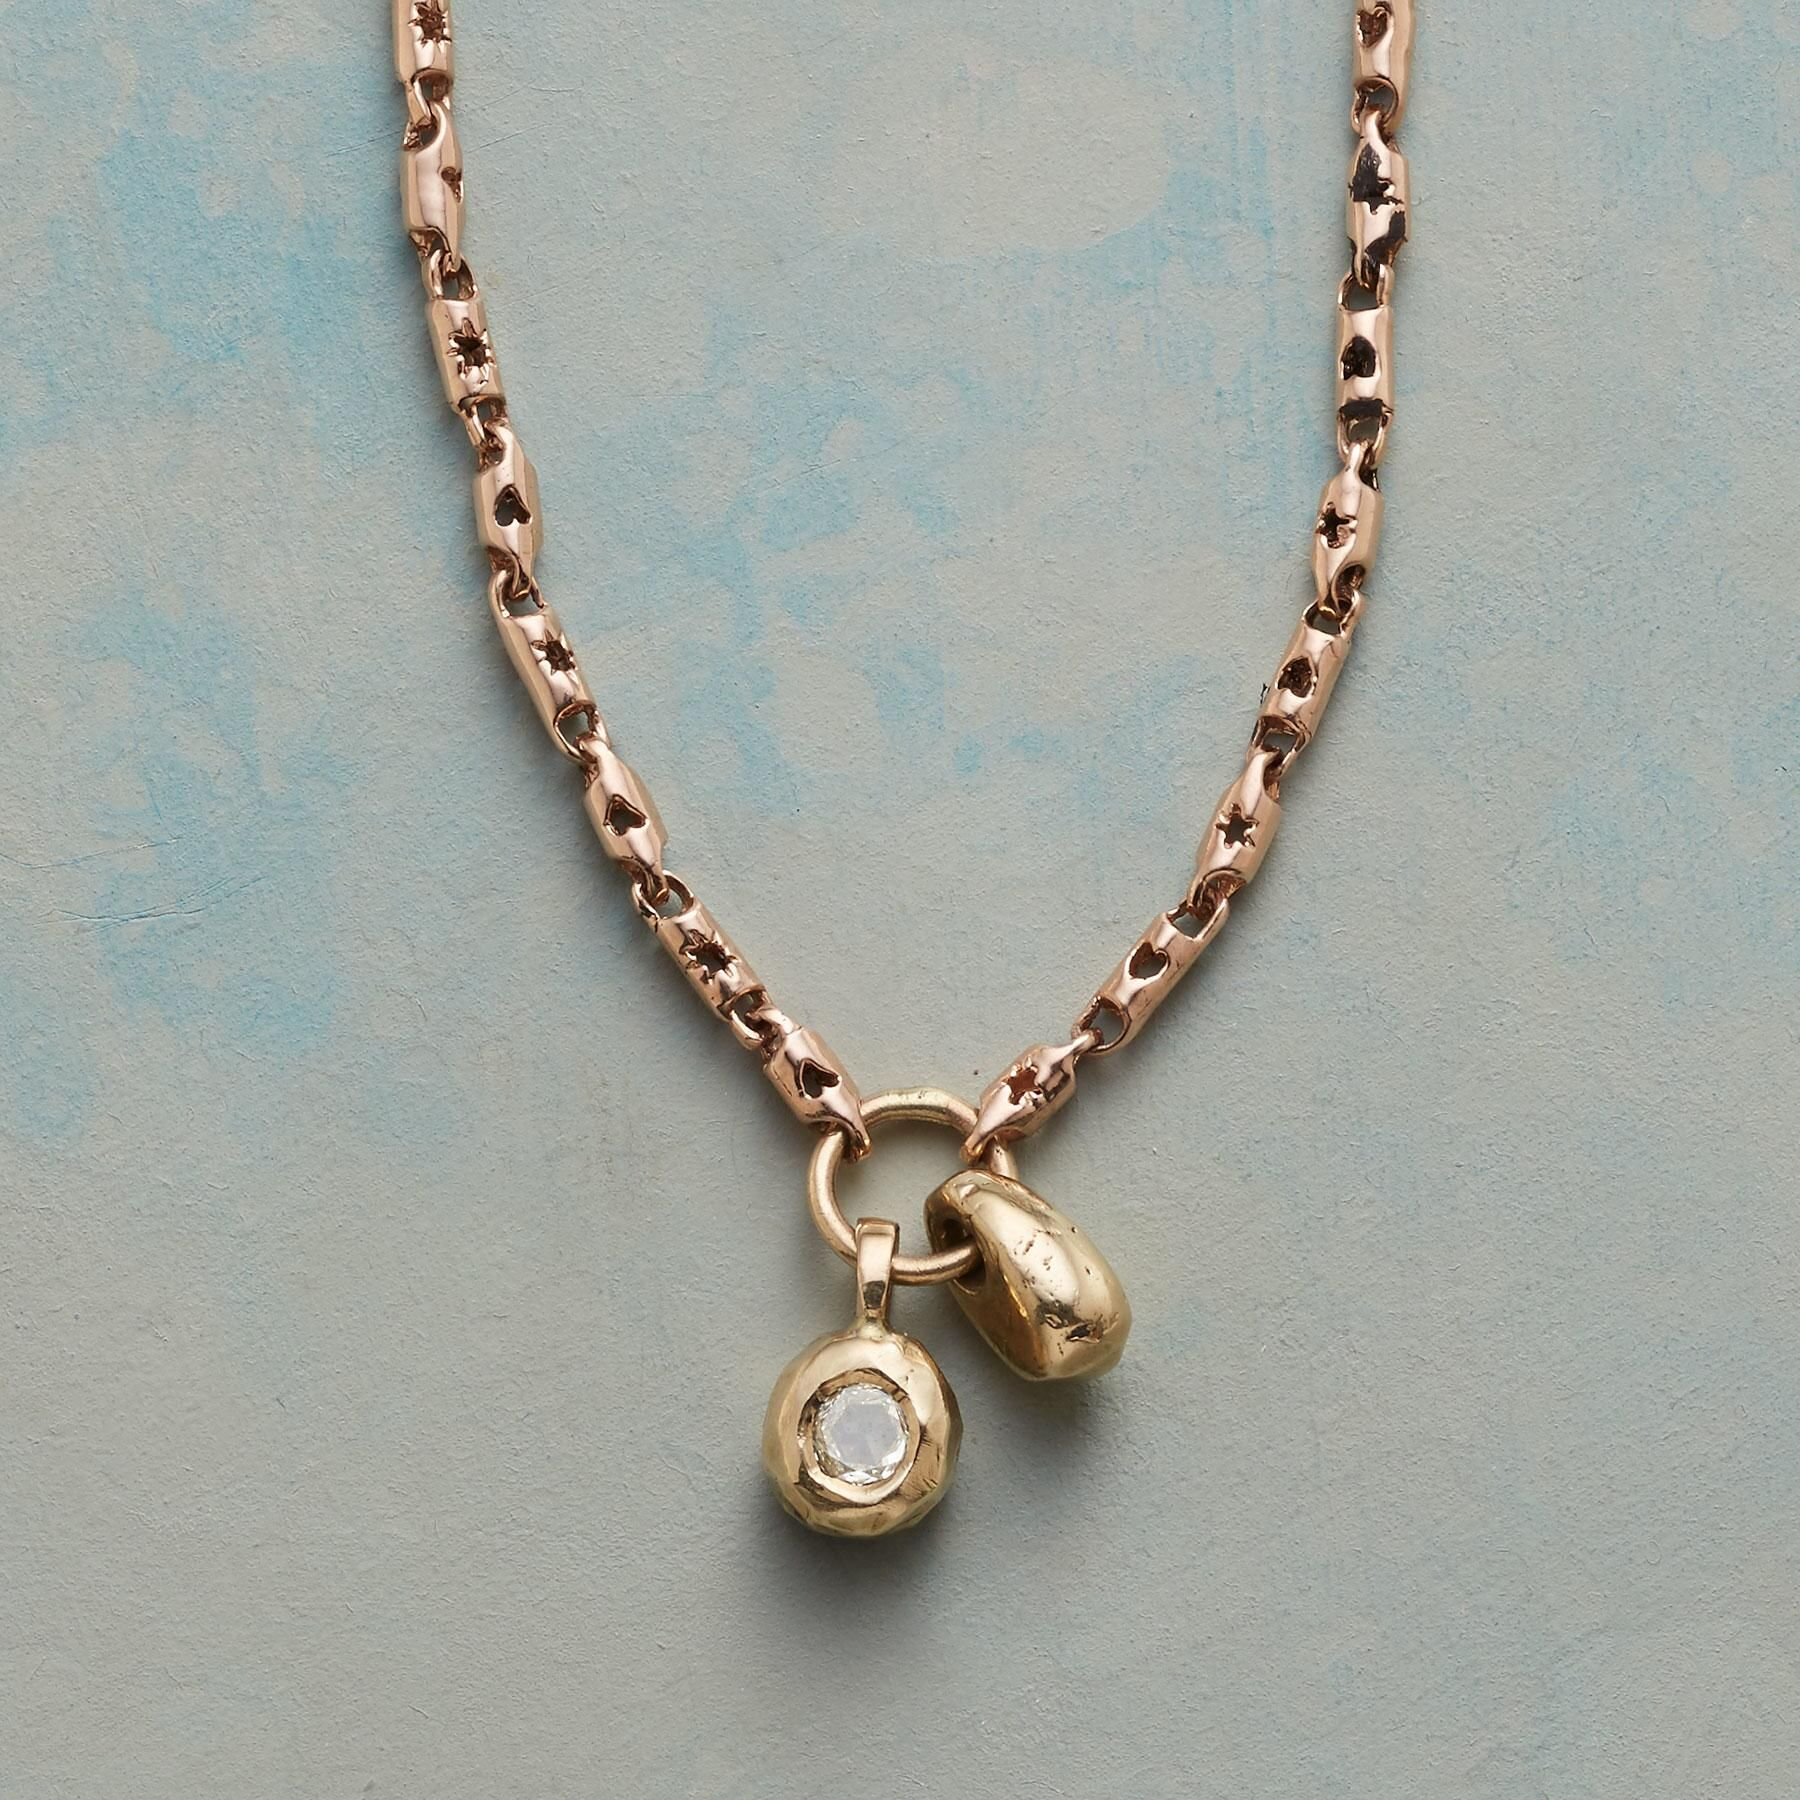 Touchstone diamond necklace handcast links of kt rose gold bear